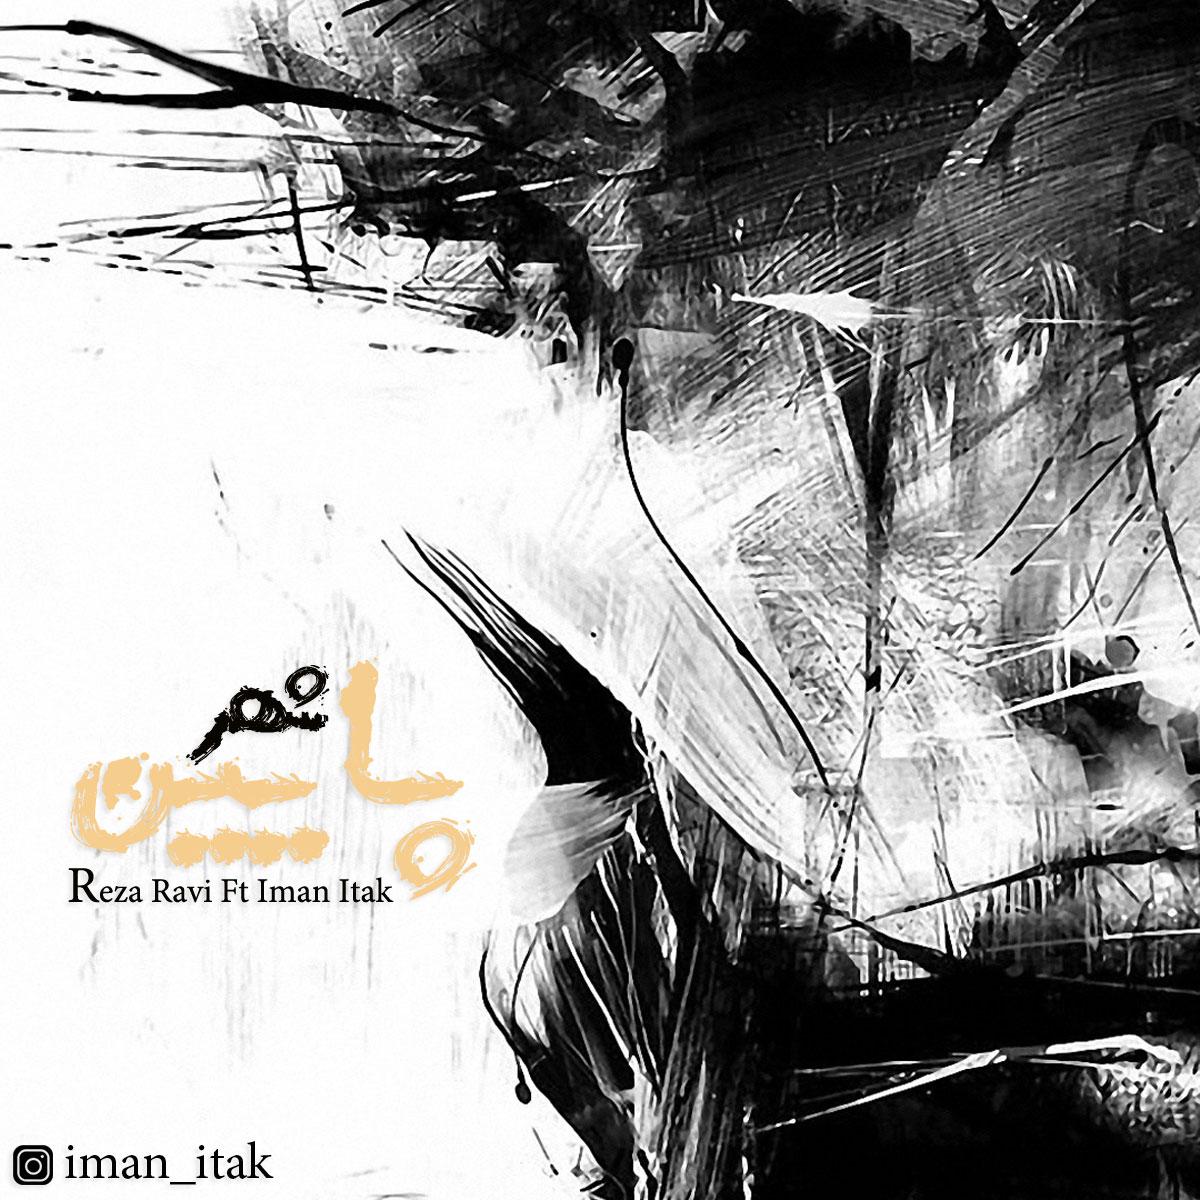 Reza Ravi Ft Iman itak – Pain Shahr